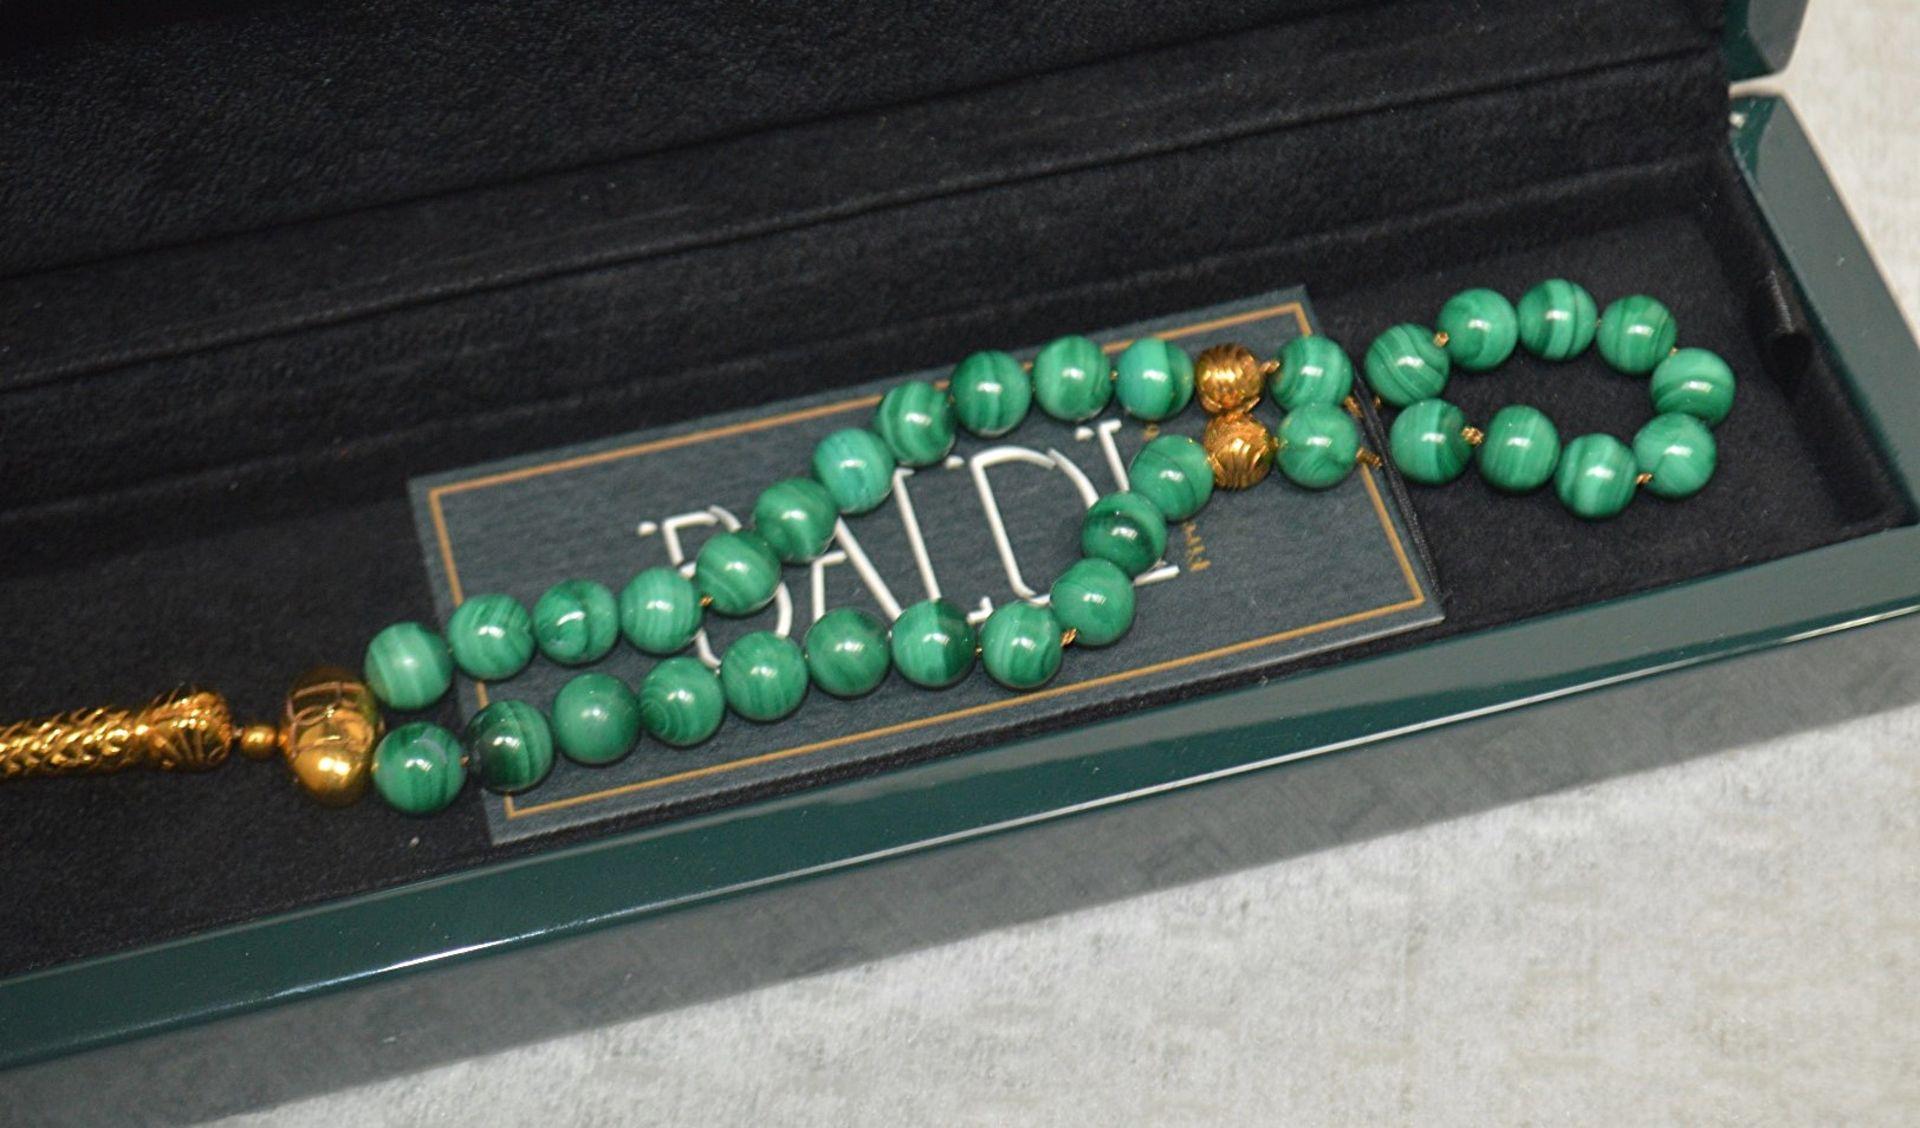 1 x BALDI 'Home Jewels' Italian Hand-crafted Artisan MISBAHA Prayer Beads In Green Malachite And - Image 3 of 5